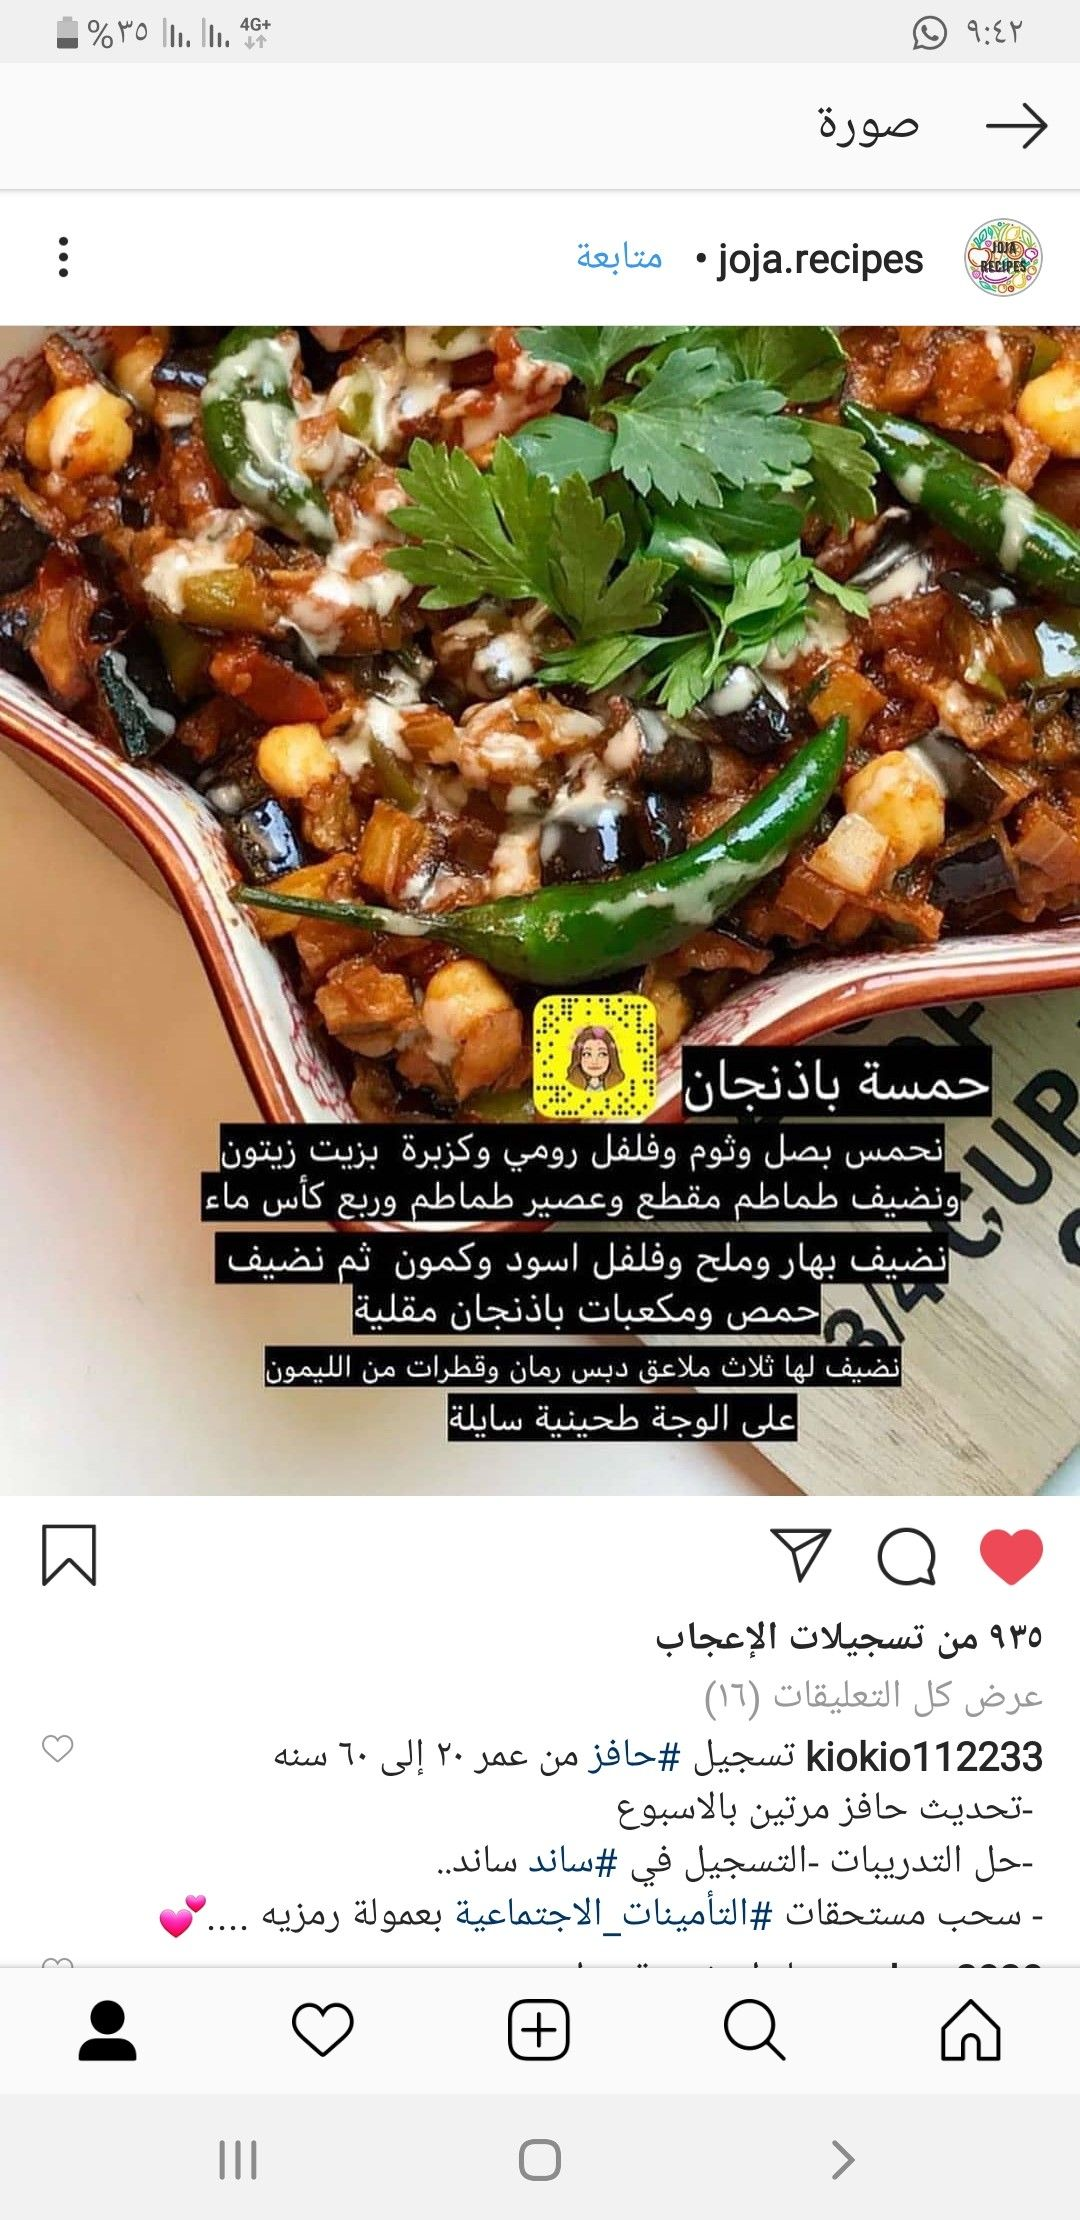 Pin By Hader Atef On طبخ وتقديمات Food Cooking Arabic Food